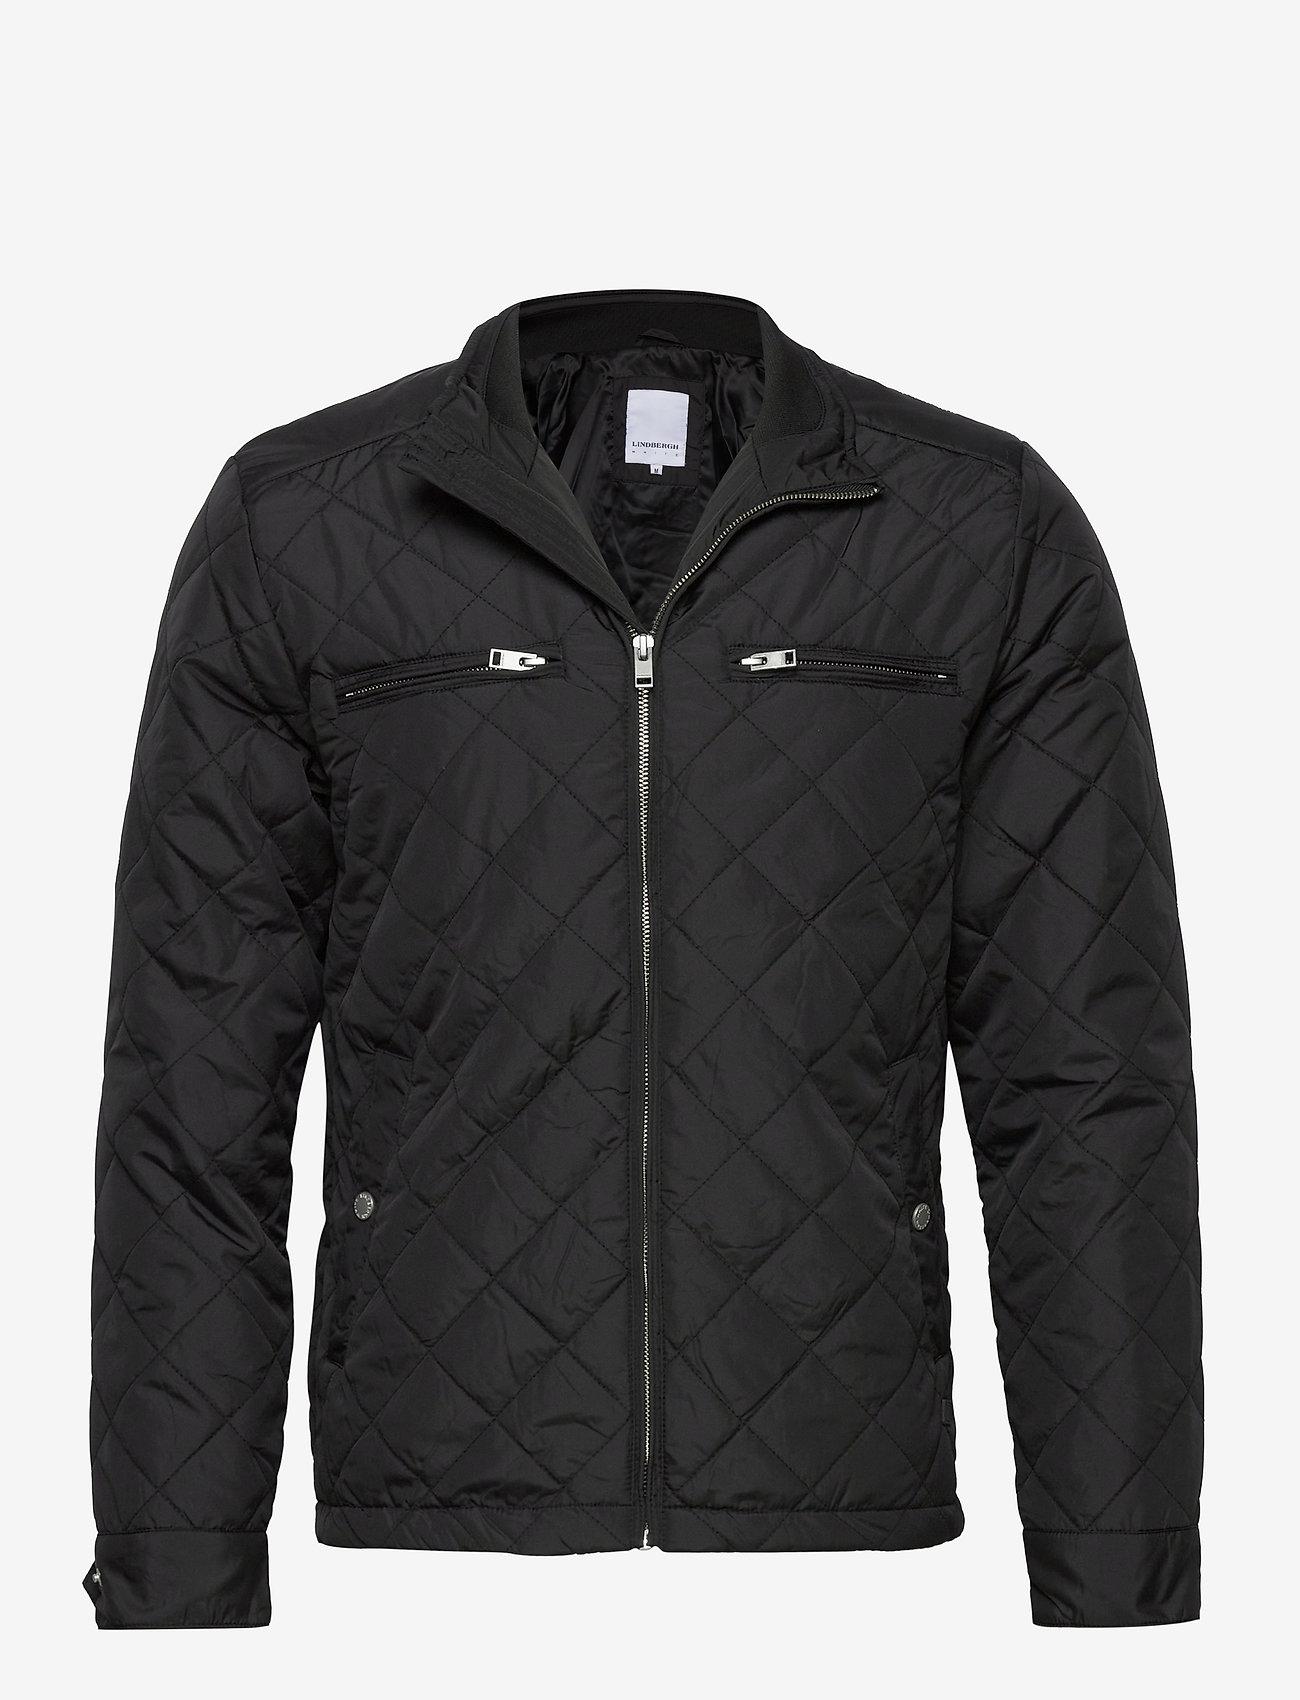 Lindbergh Quilted jacket - Jakker og frakker BLACK - Menn Klær